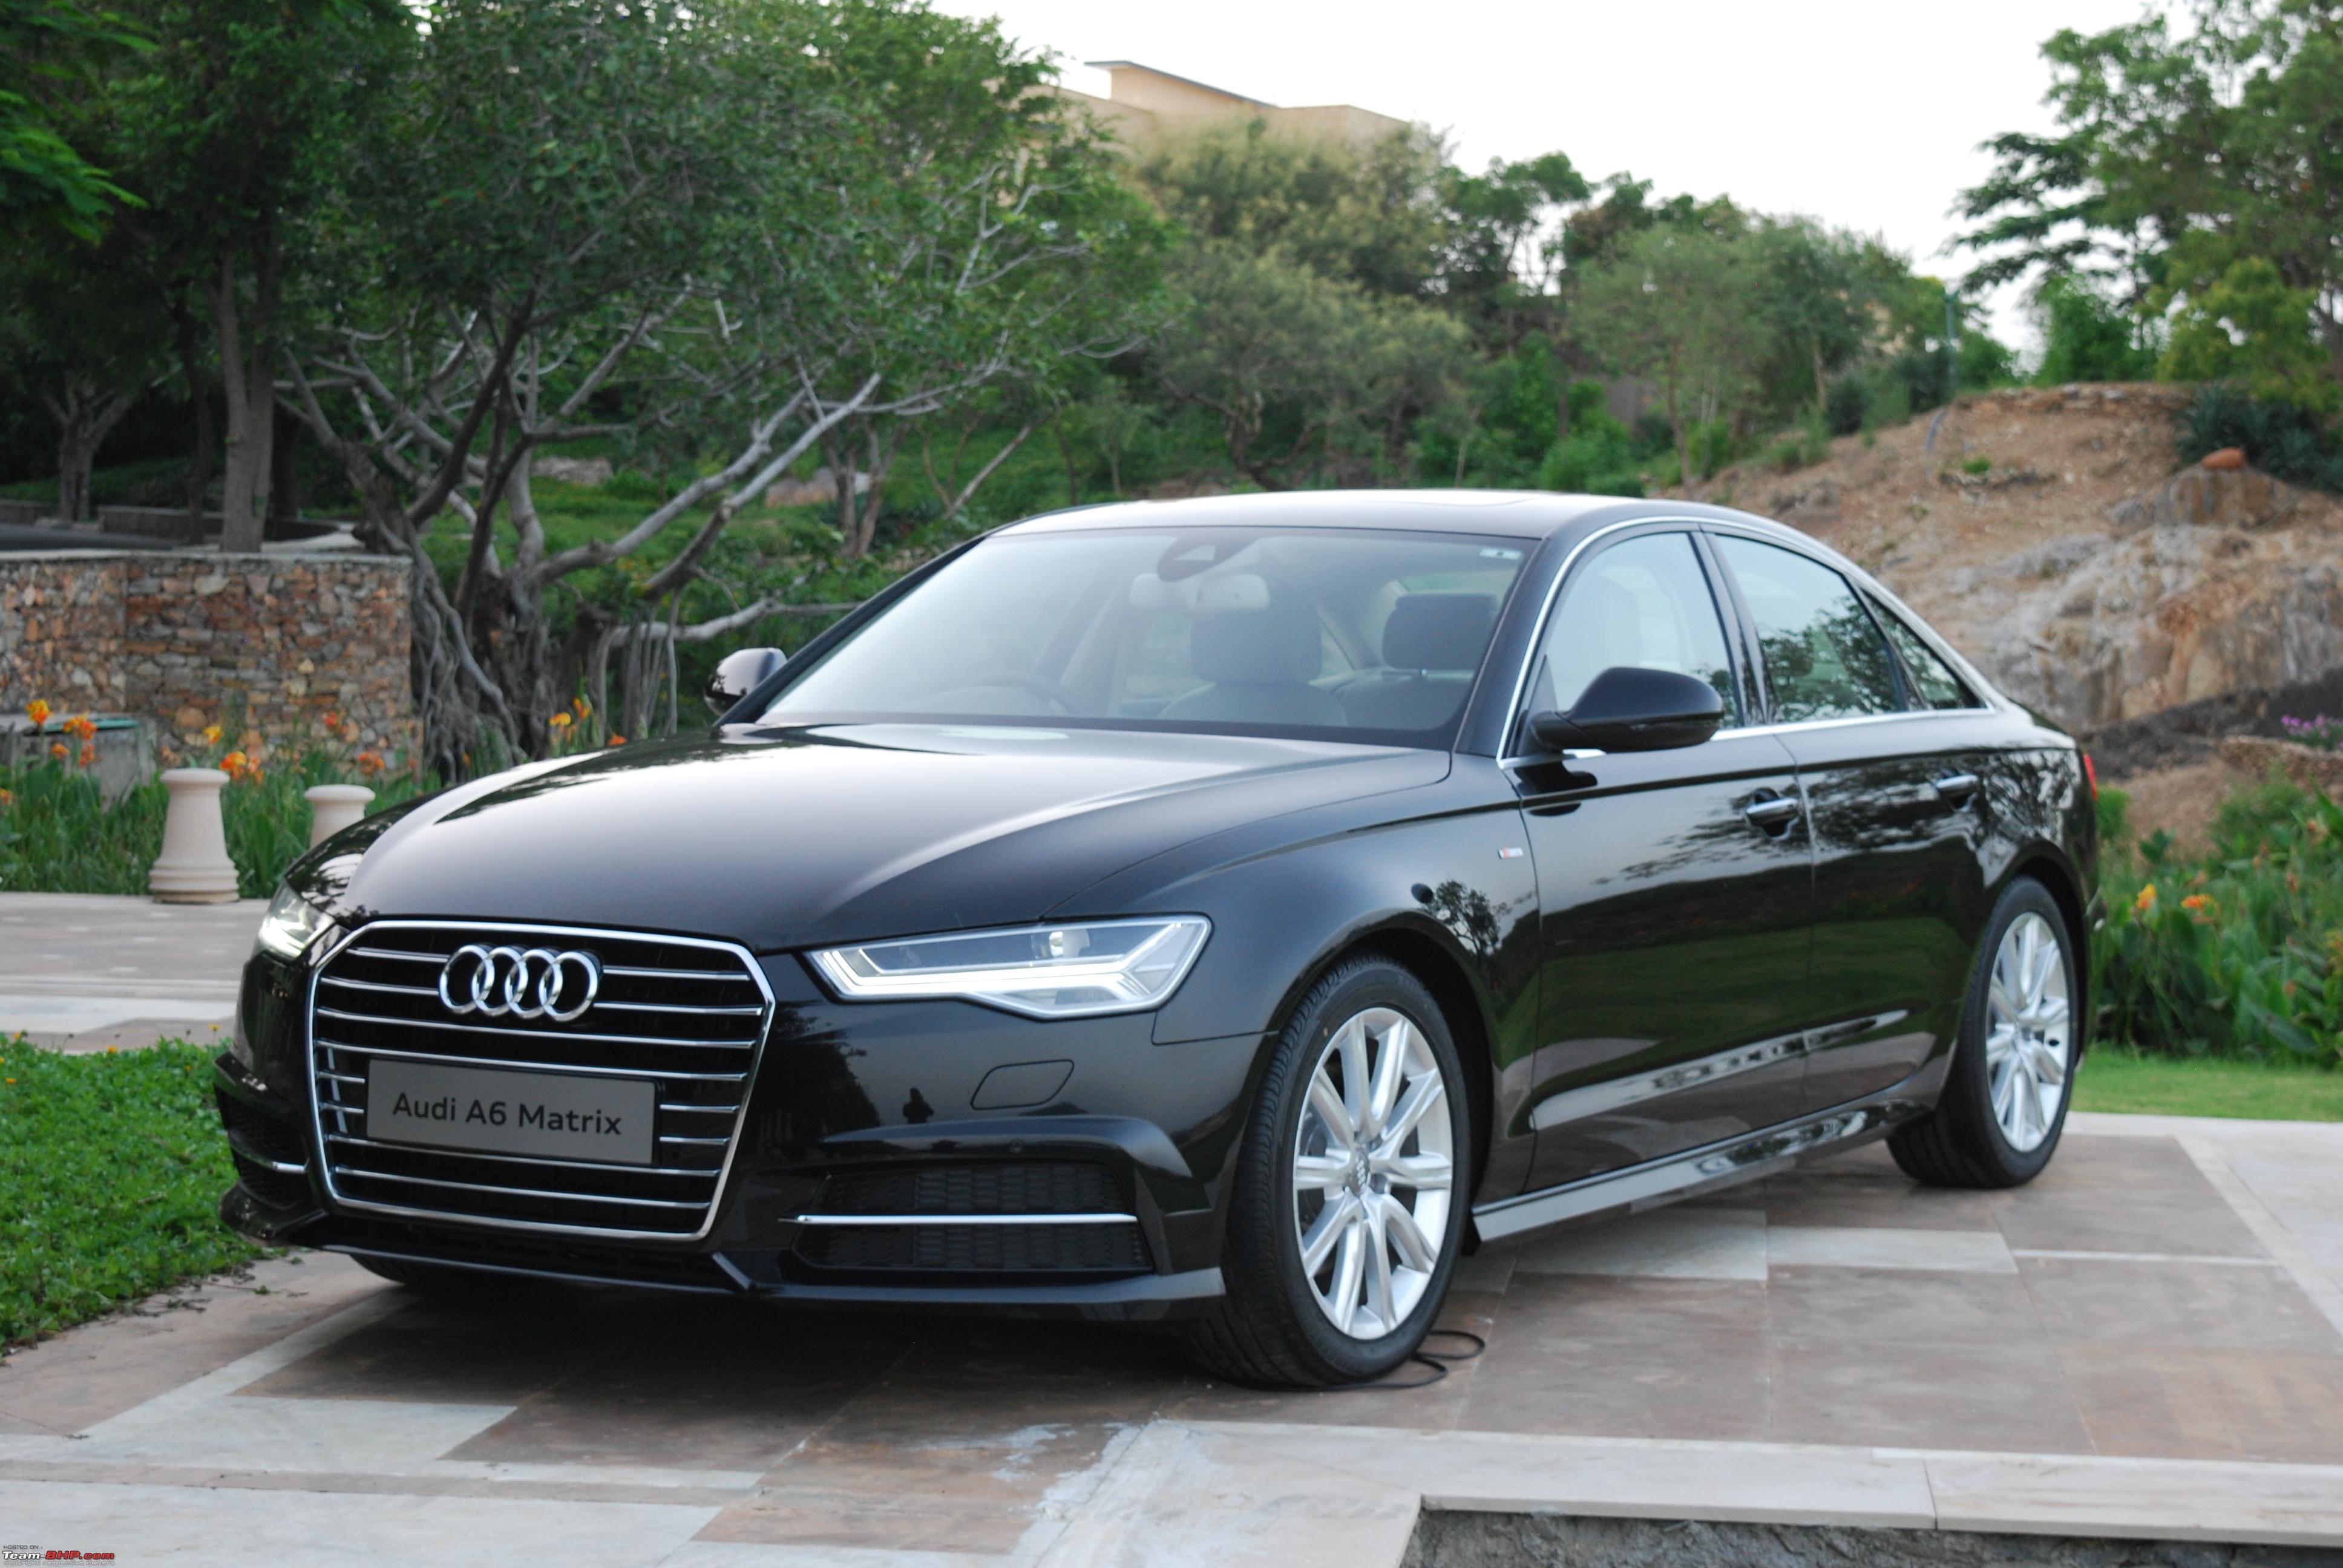 Audi A6 Pics, Vehicles Collection